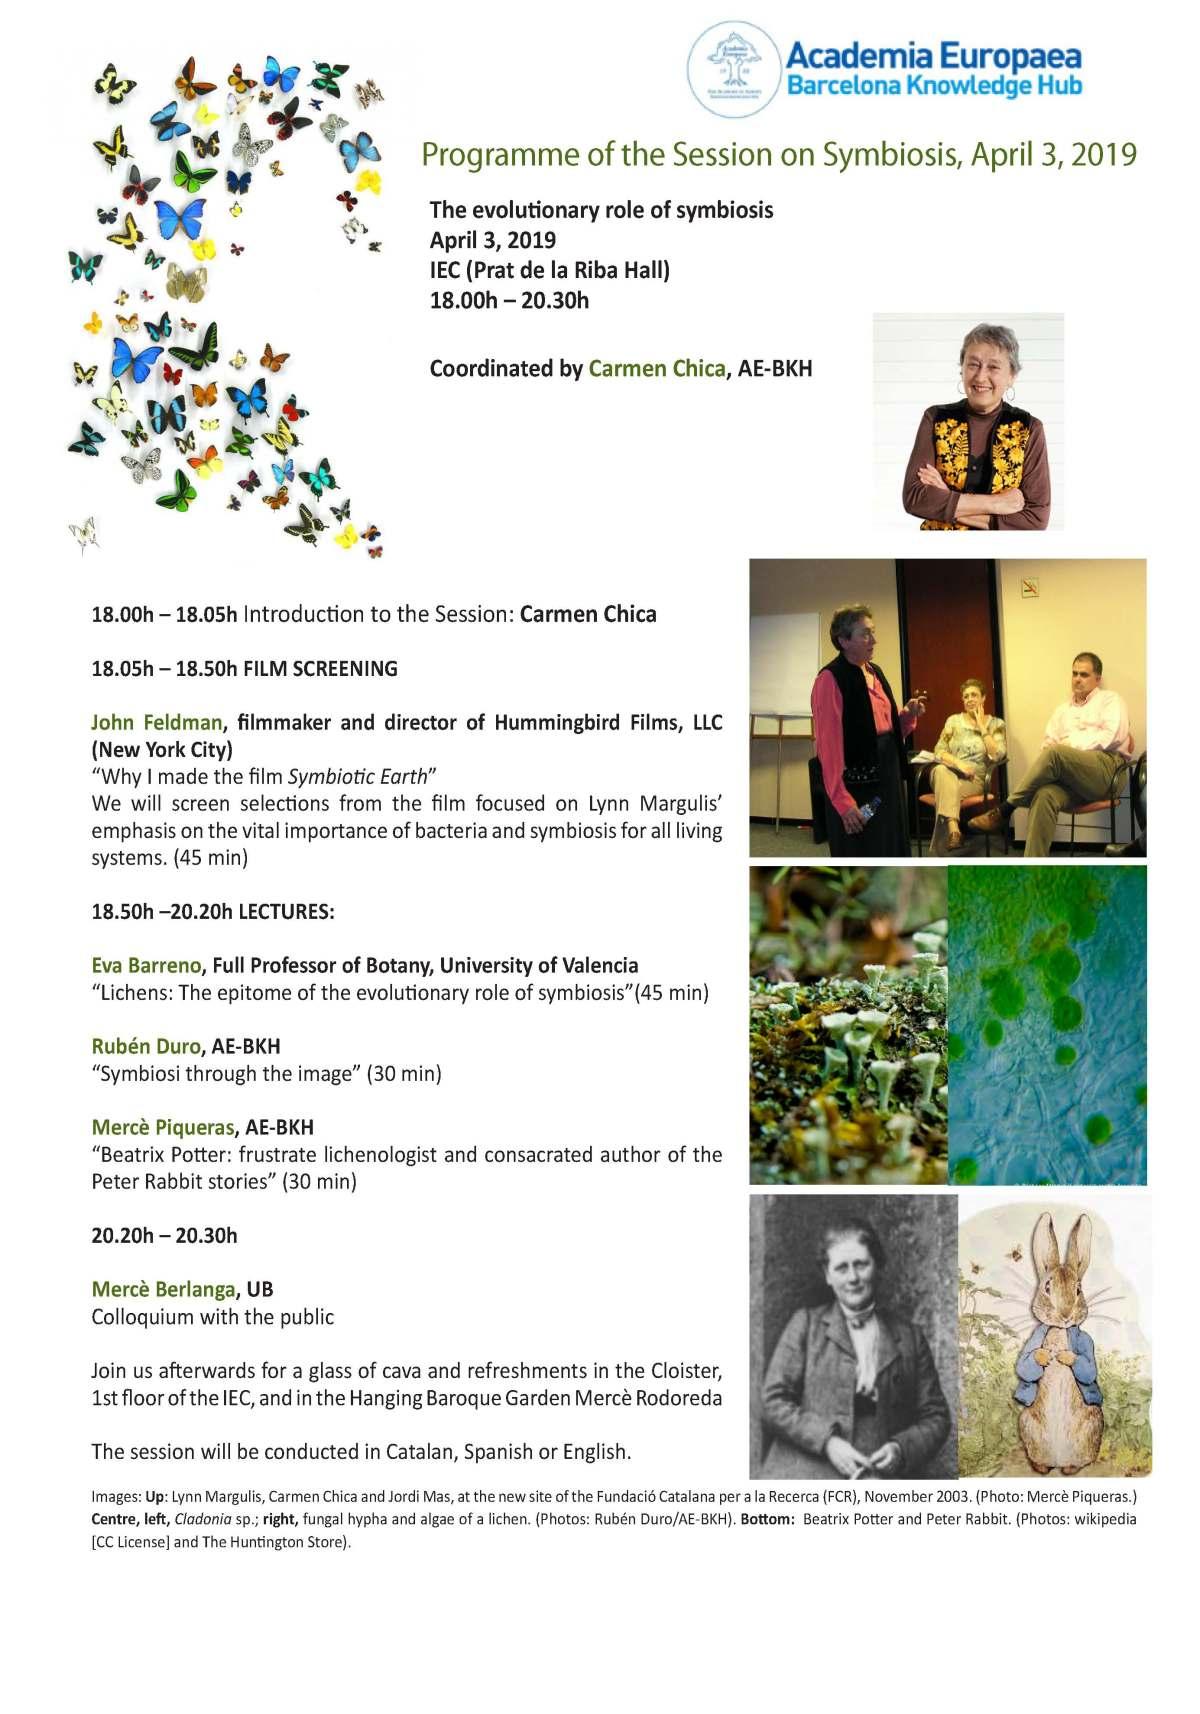 Sesión sobre Simbiosis en la Academia Europaea (Barcelonal KnowledgeHub)